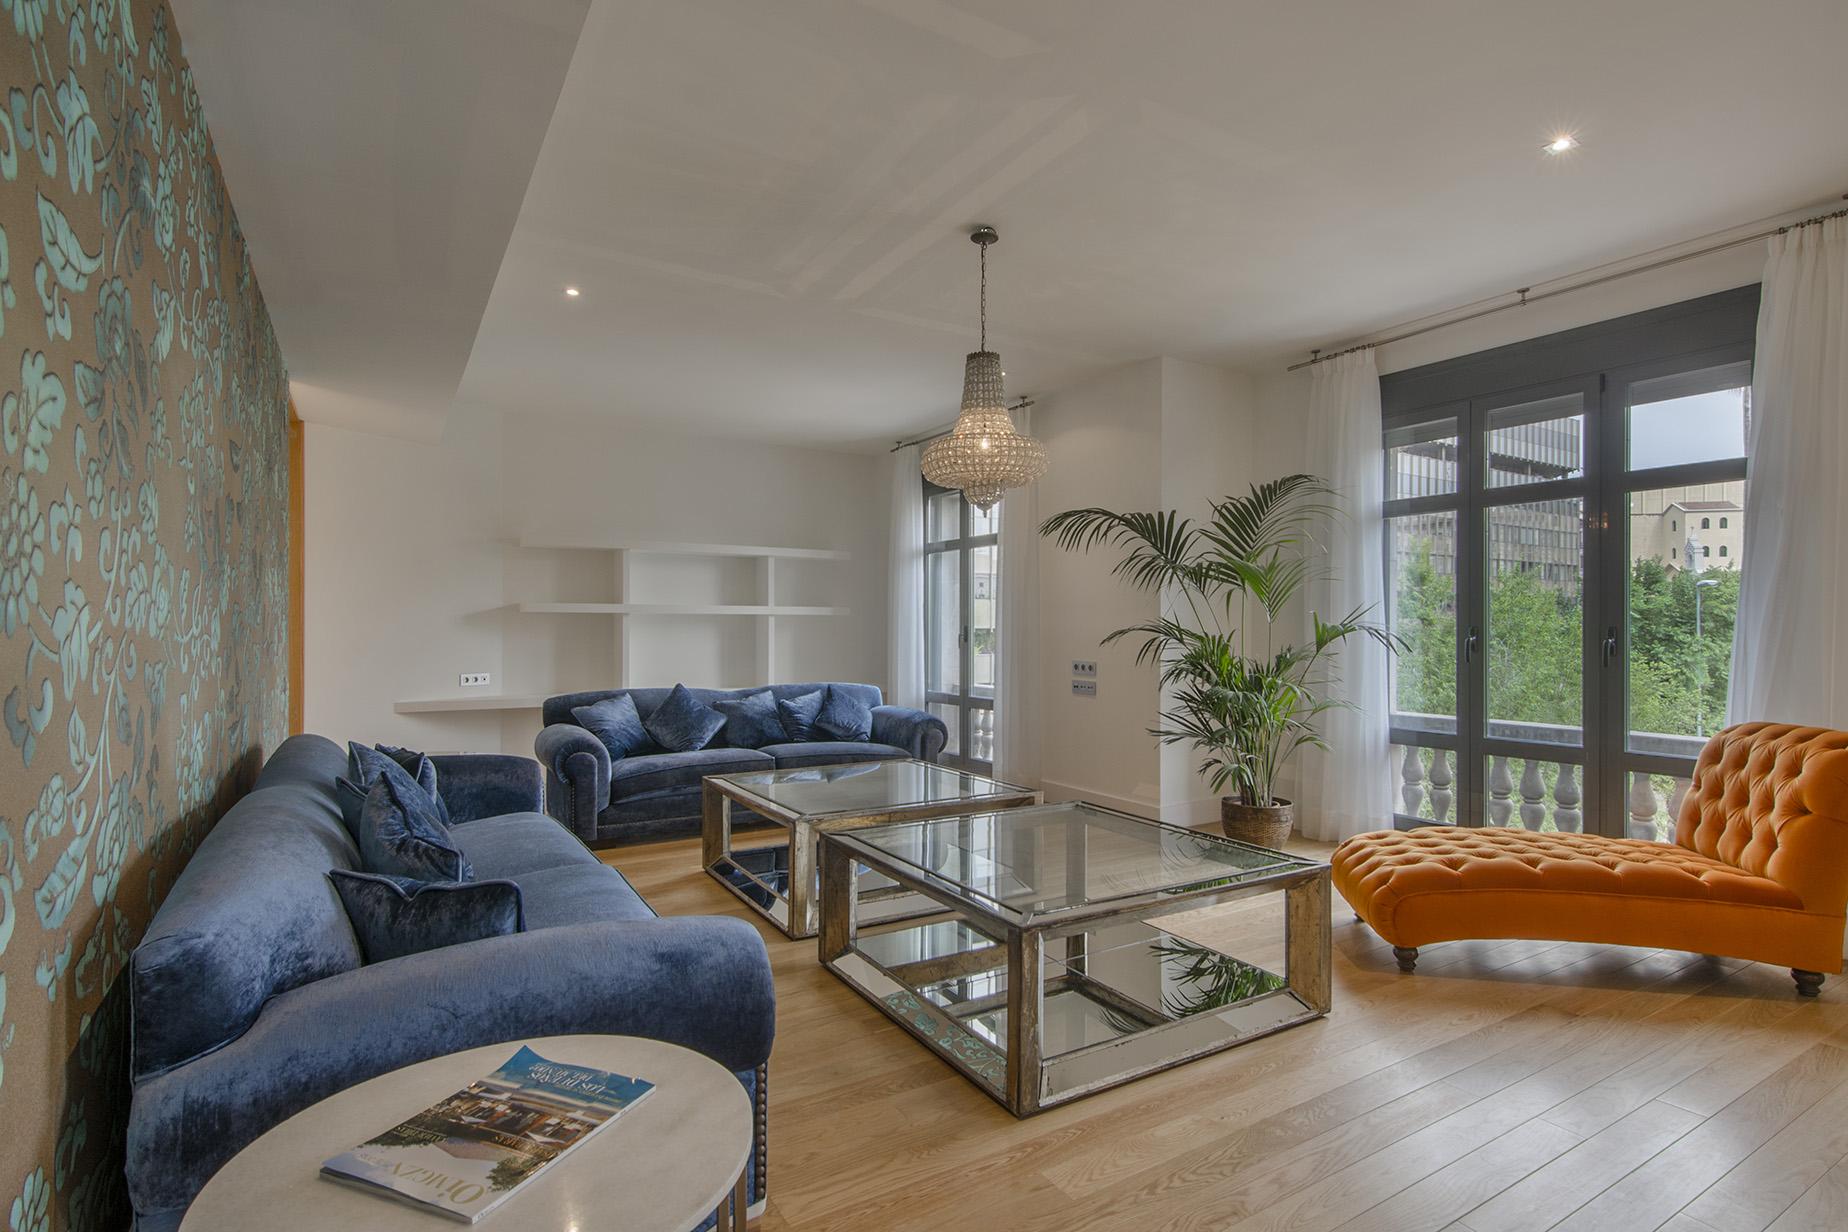 Wohnung für Verkauf beim New apartments in the center of Barcelona with Park View Eixample, Barcelona City, Barcelona 08007 Spanien